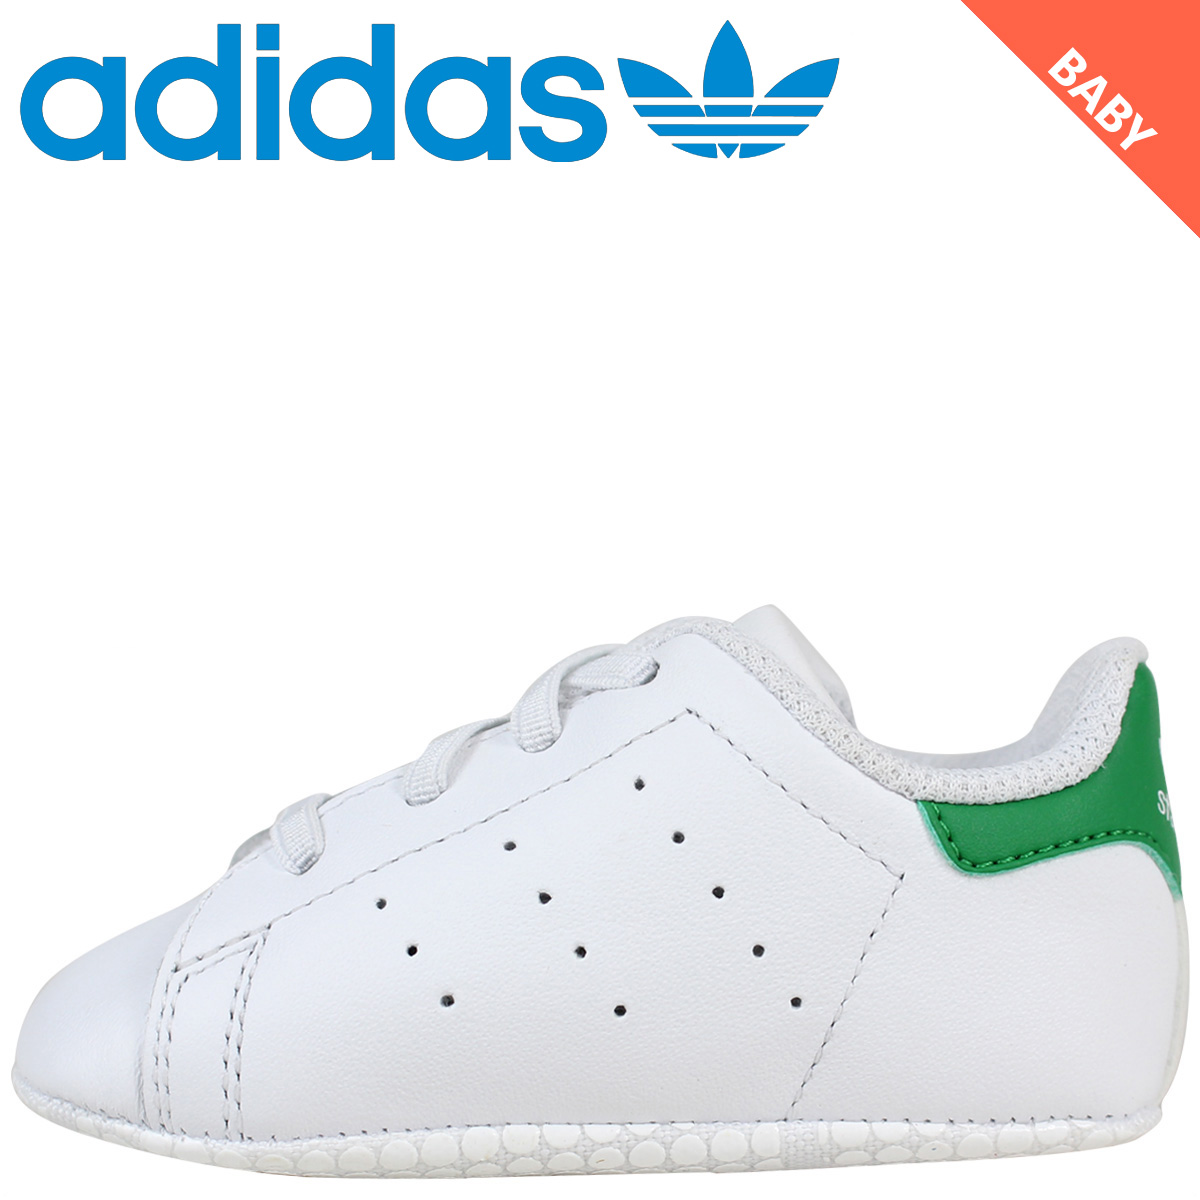 SneaK Online Shop Market: Rakuten Global Market: Shop Adidas Stan Smith kids f60d49